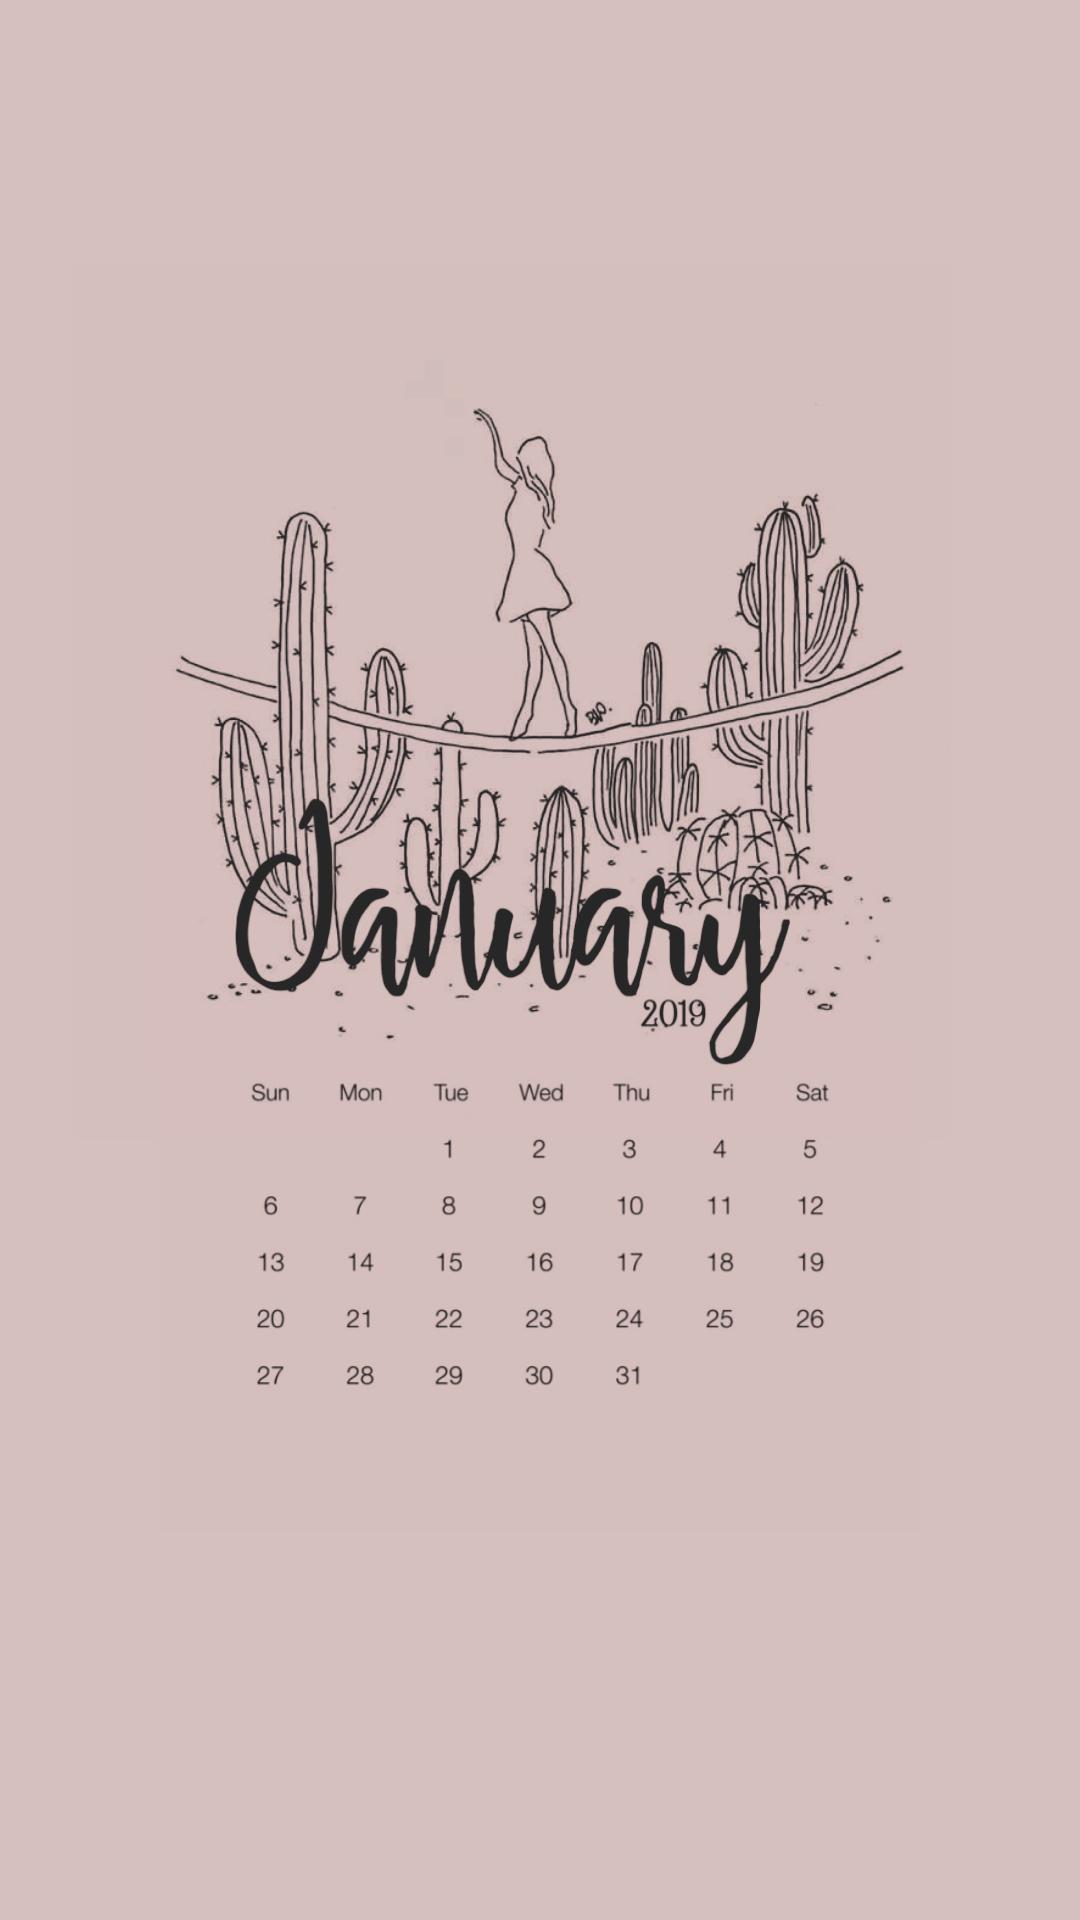 Calendar Wallpaper | Tumblr with regard to Studyblr Calendar 2020